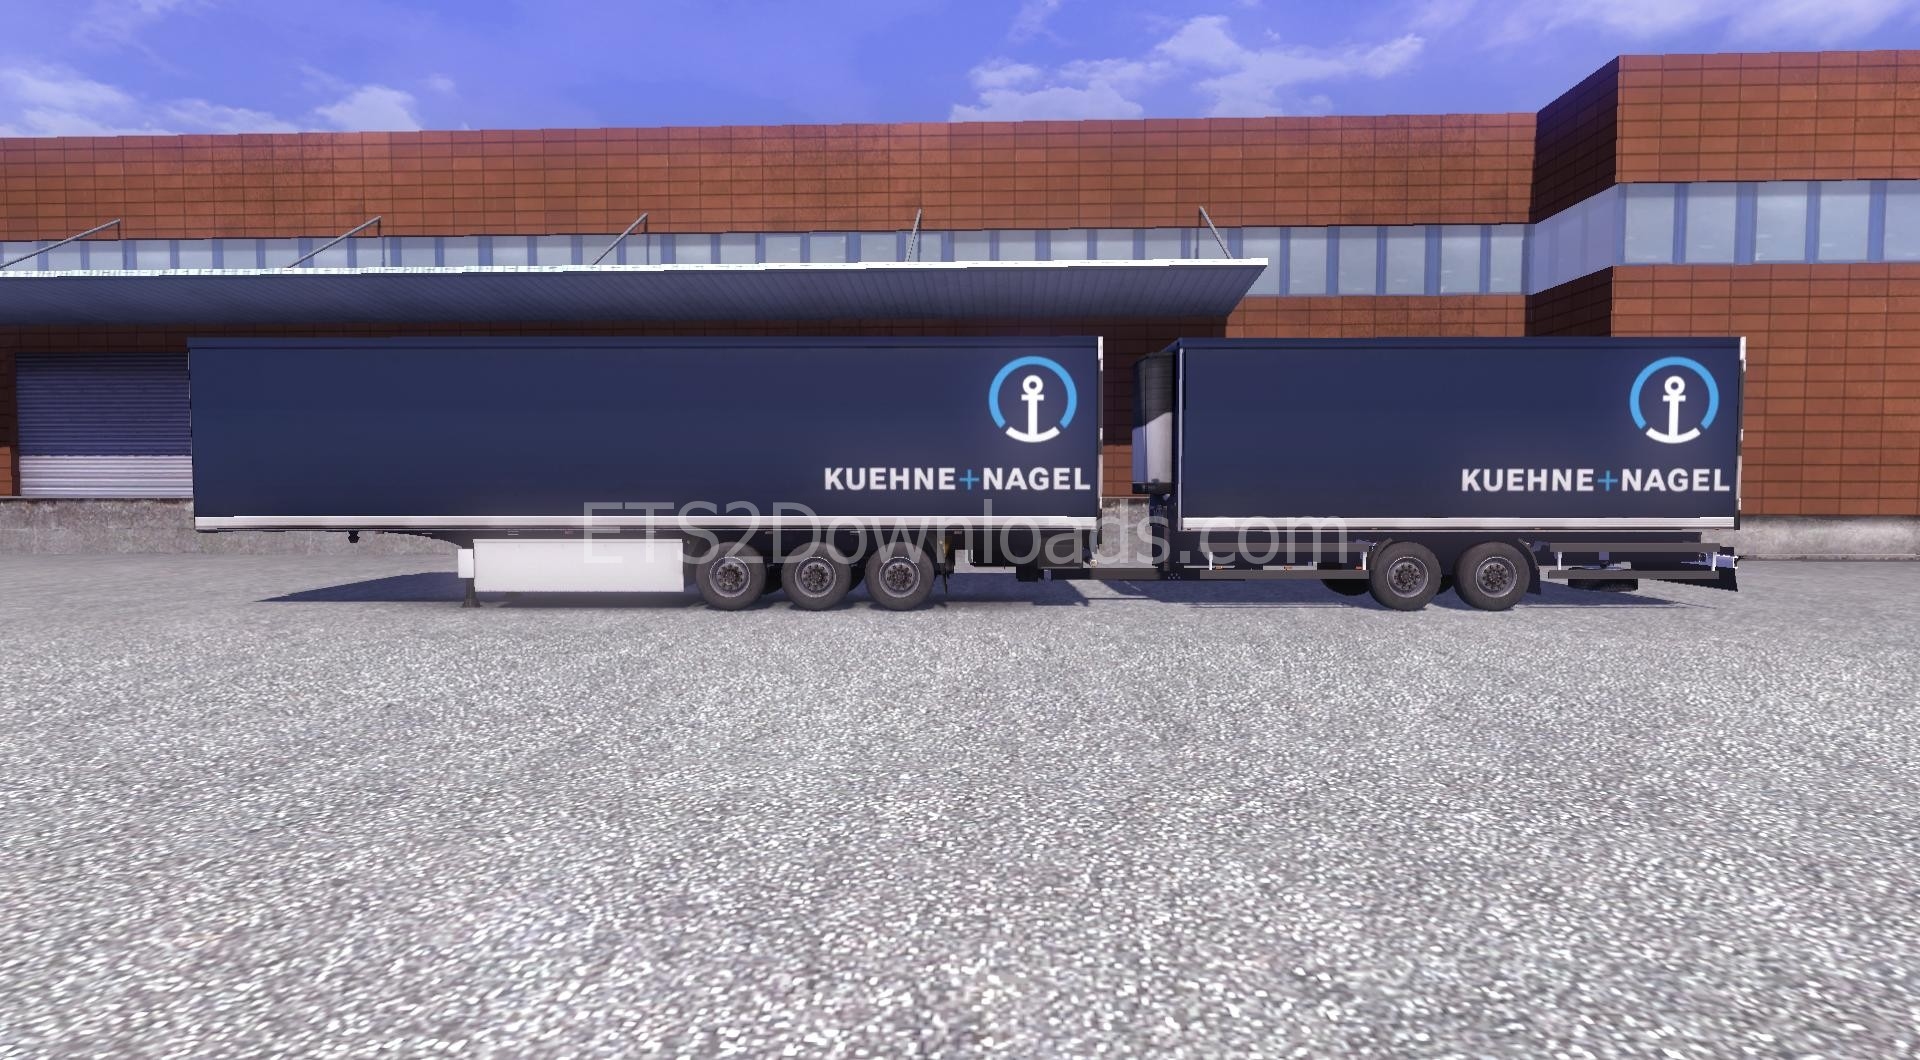 kuehne-nagel-krone-trailer-ets2